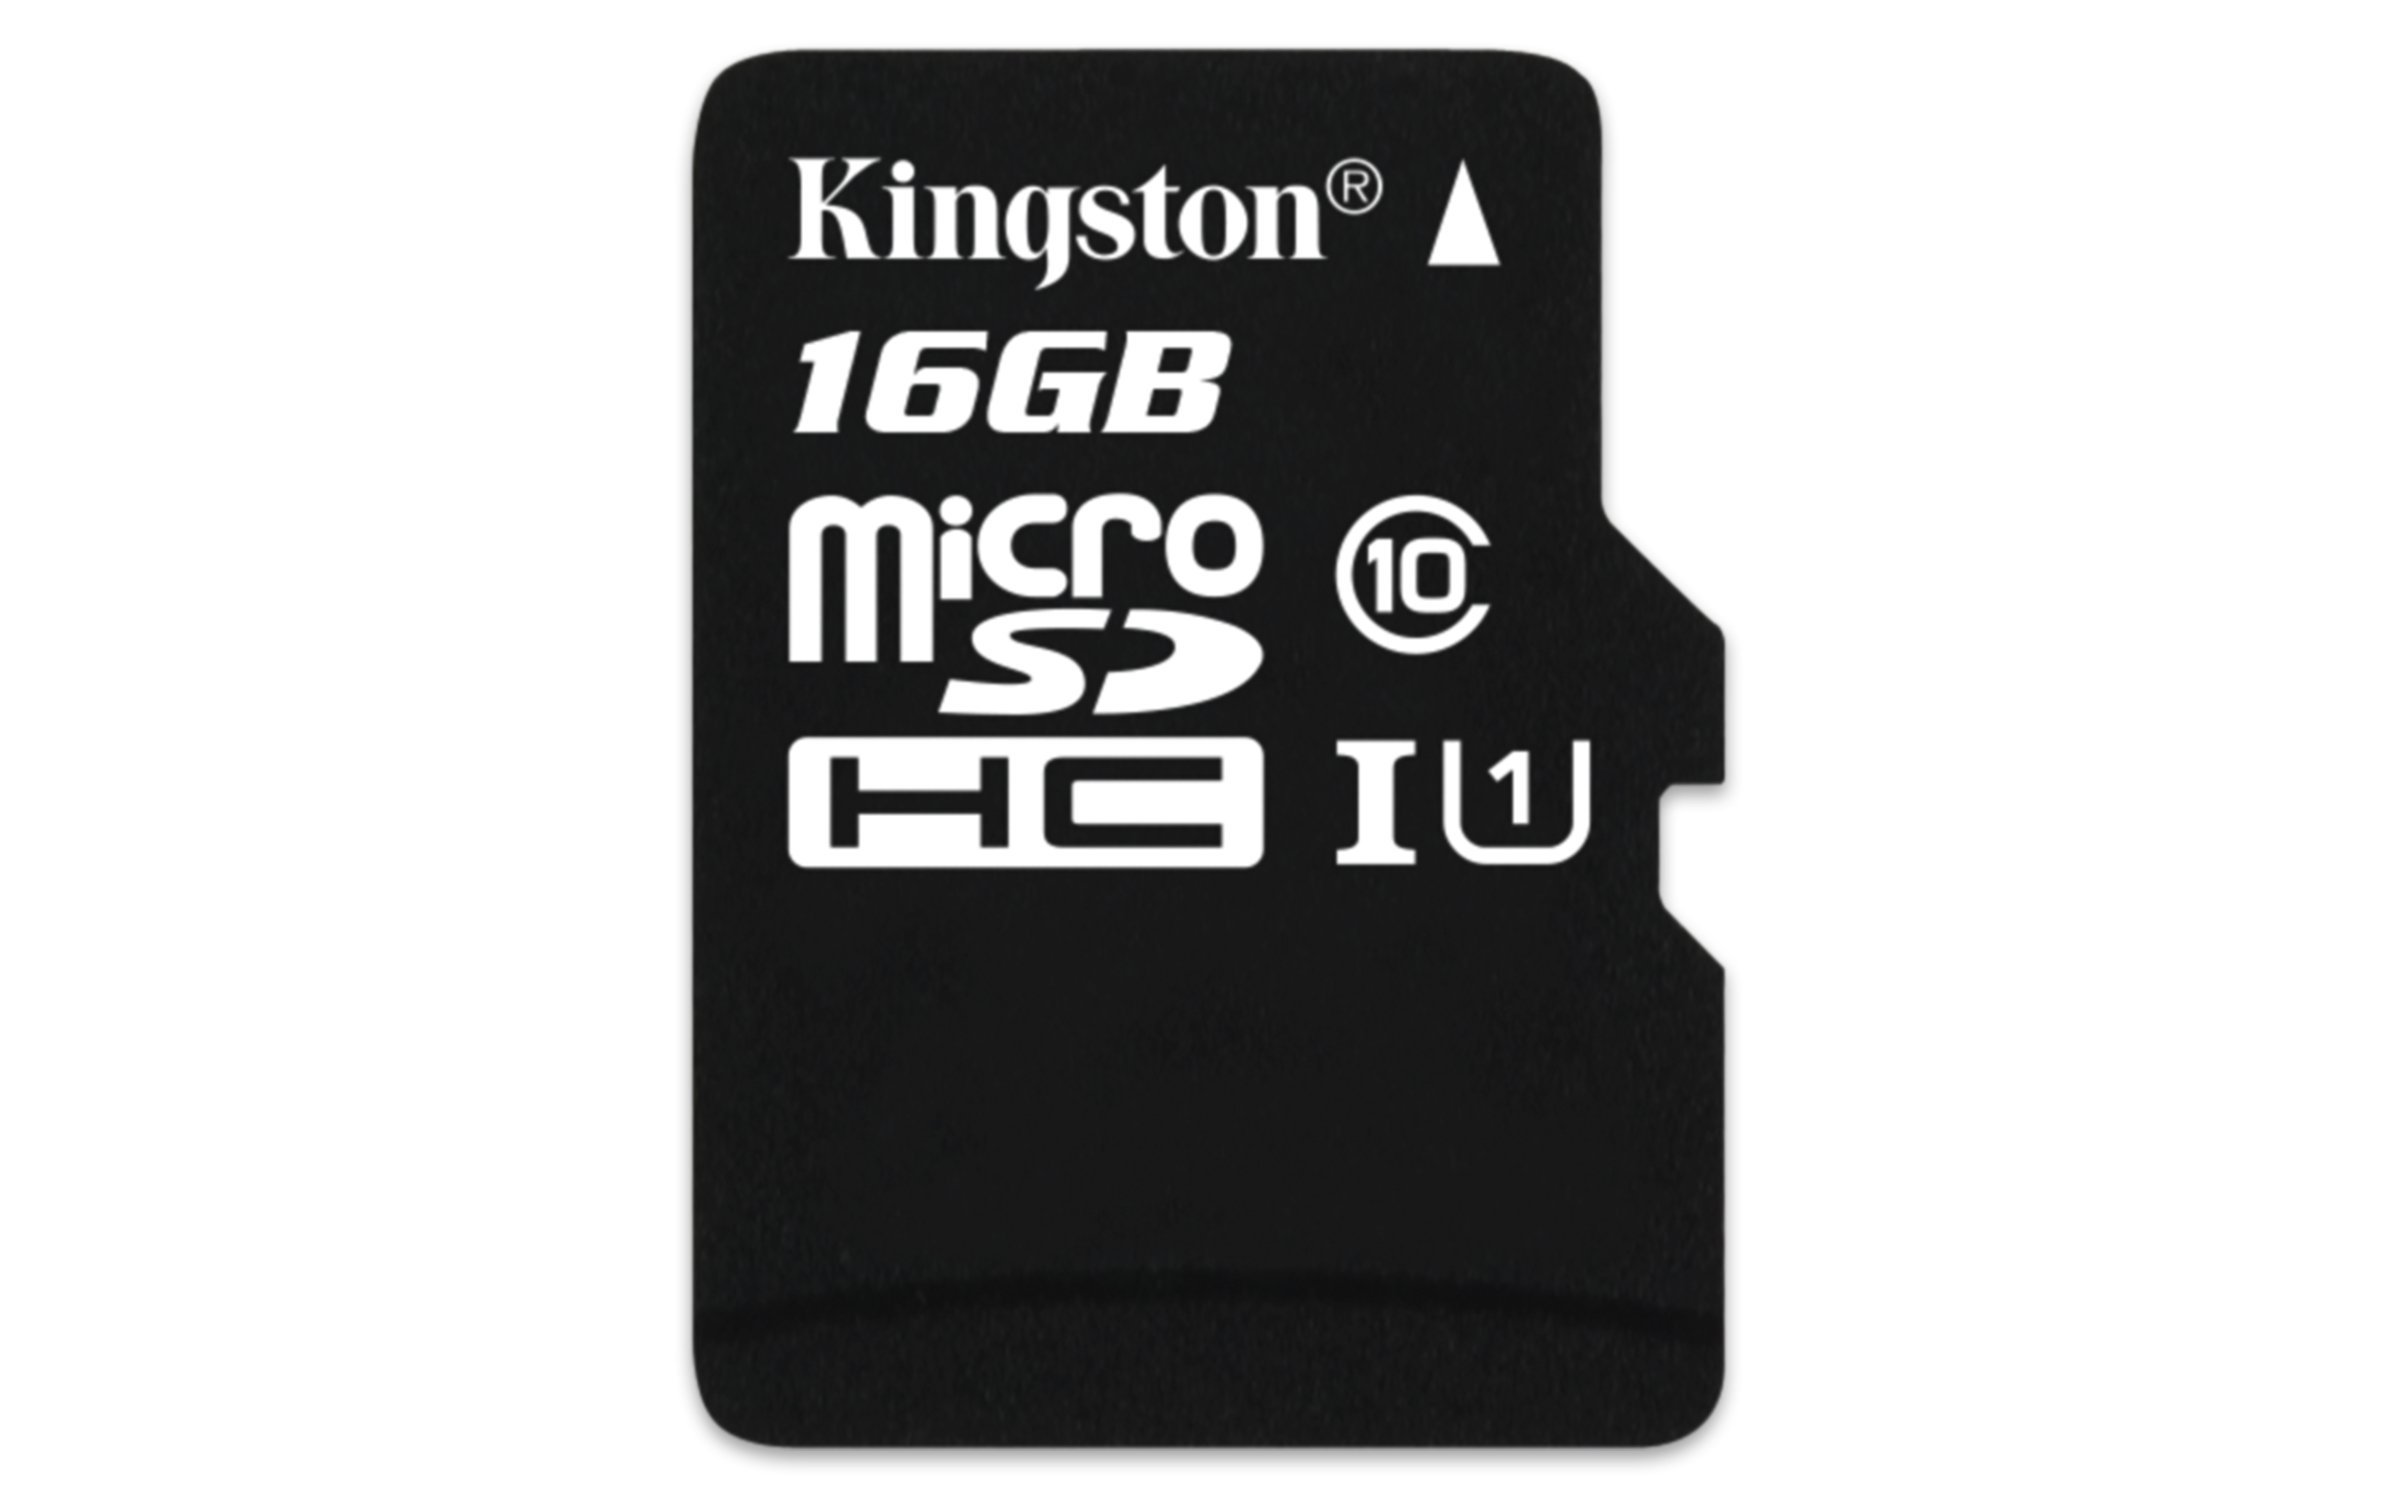 Kingston Digital 16GB Micro SDHC UHS-I Class 10...